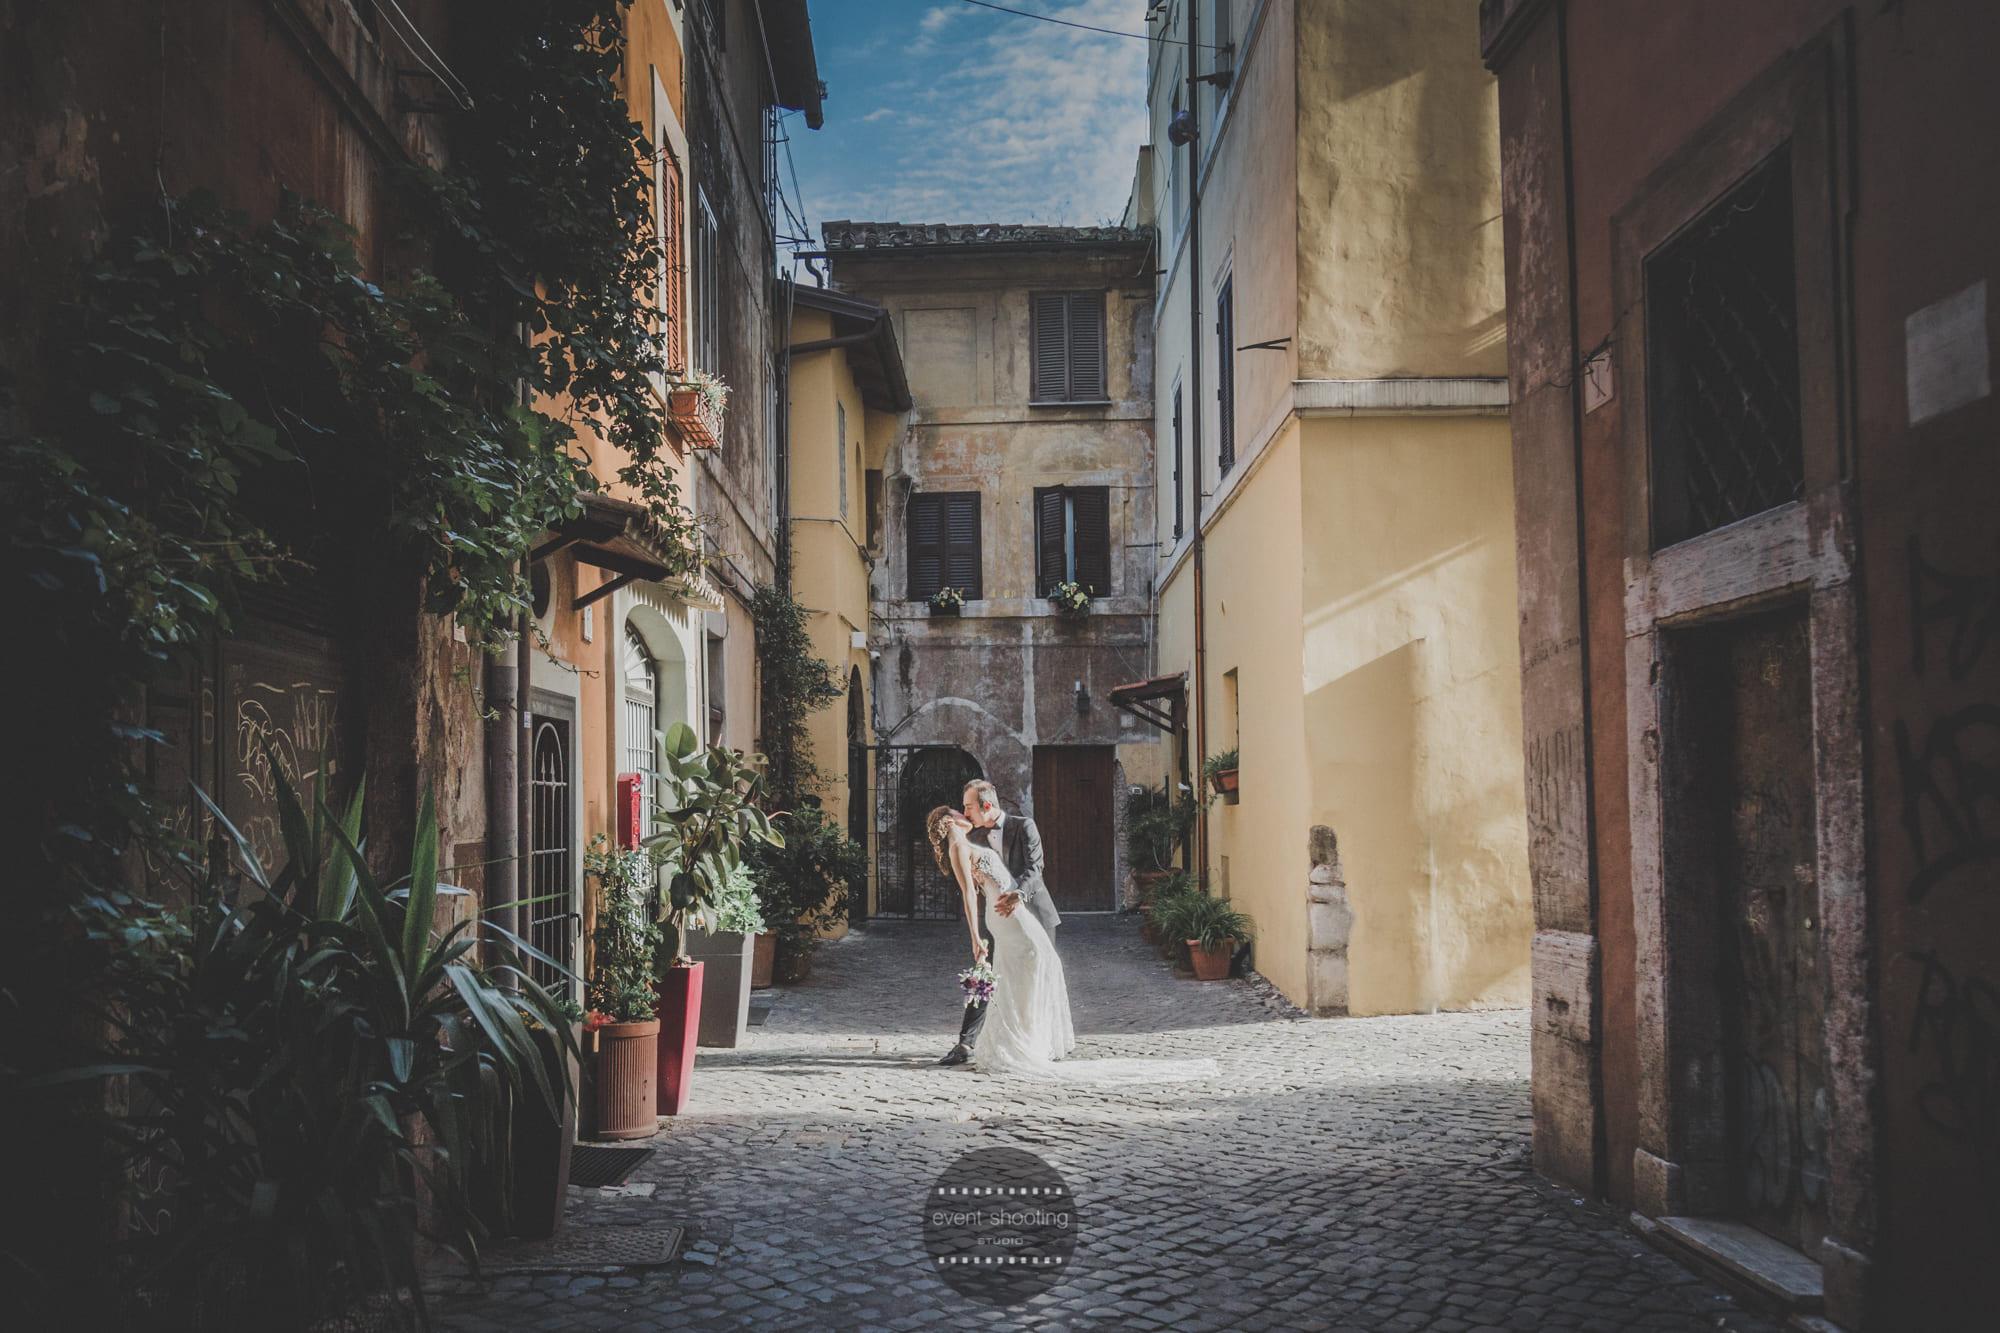 Trastevere Matrimonio Turco Event Shooting